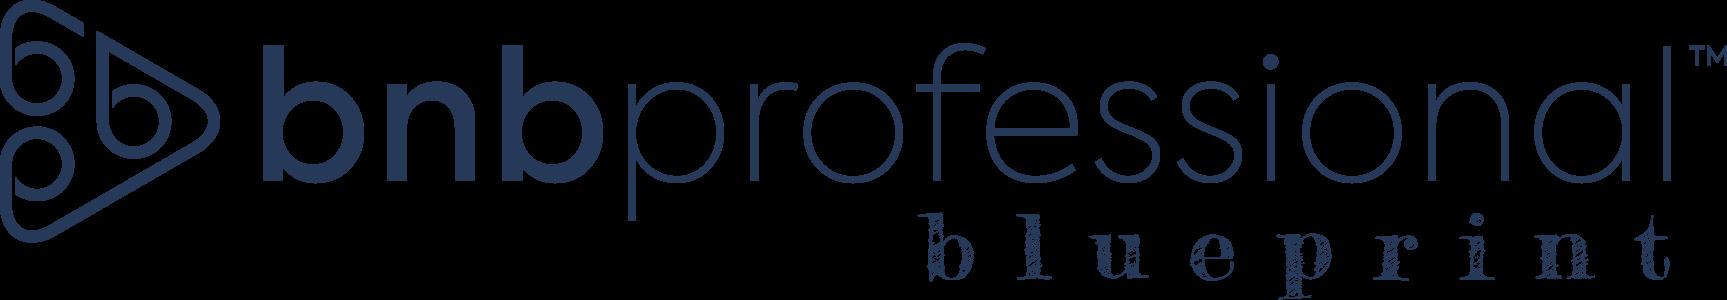 BnB Professional Blueprint